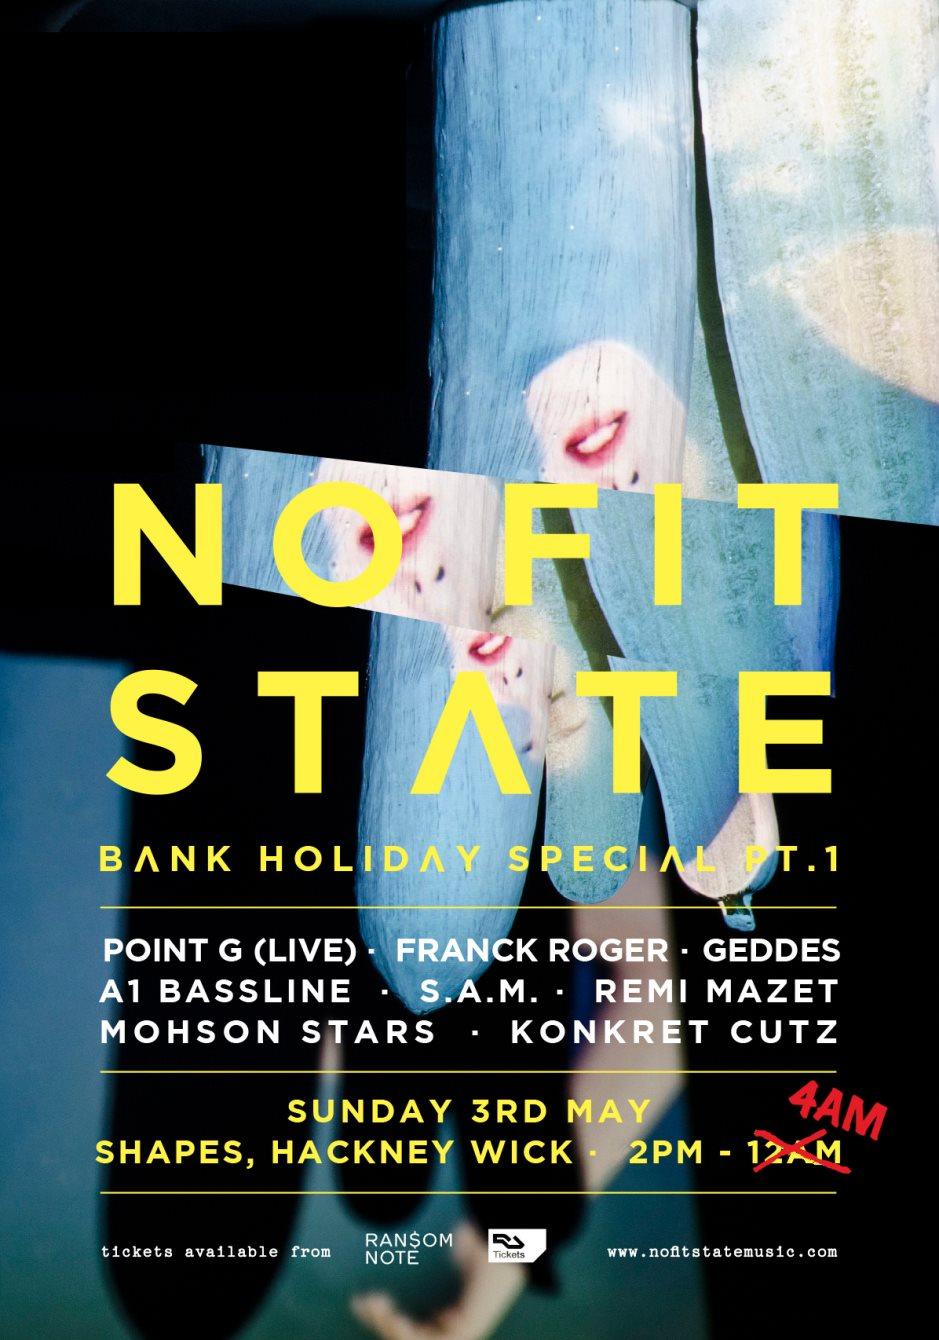 Nofitstate Bank Holiday Special Pt.1 with Point G, Franck Roger, Geddes, A1 Bassline & More - Flyer front